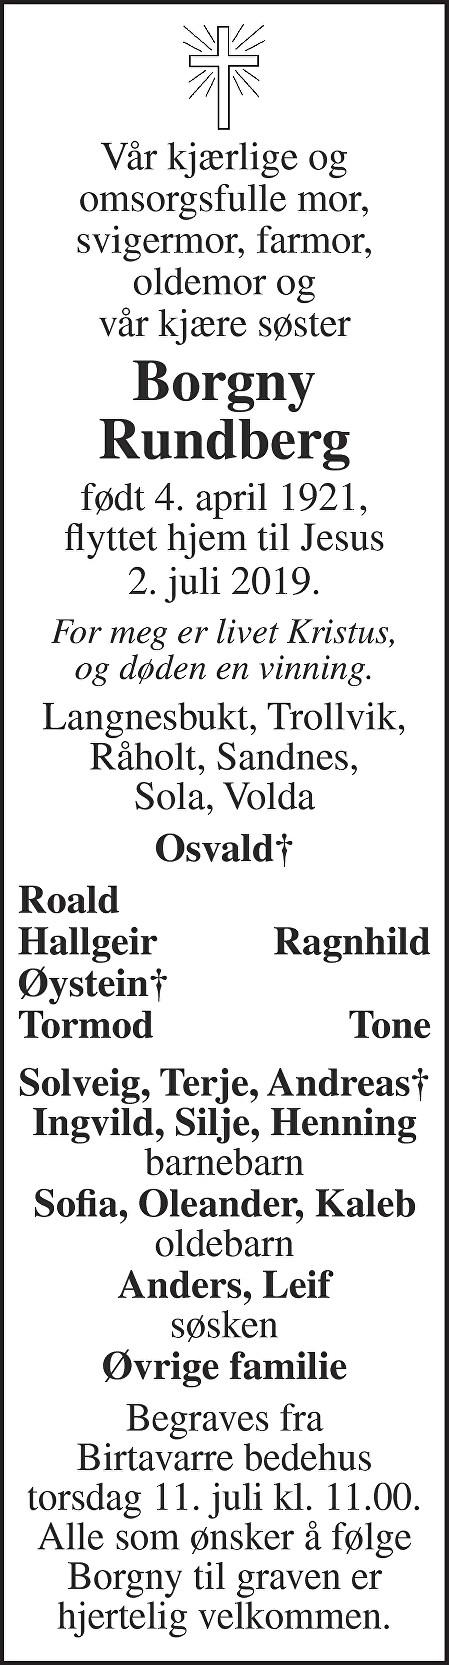 Borgny Rundberg Dødsannonse